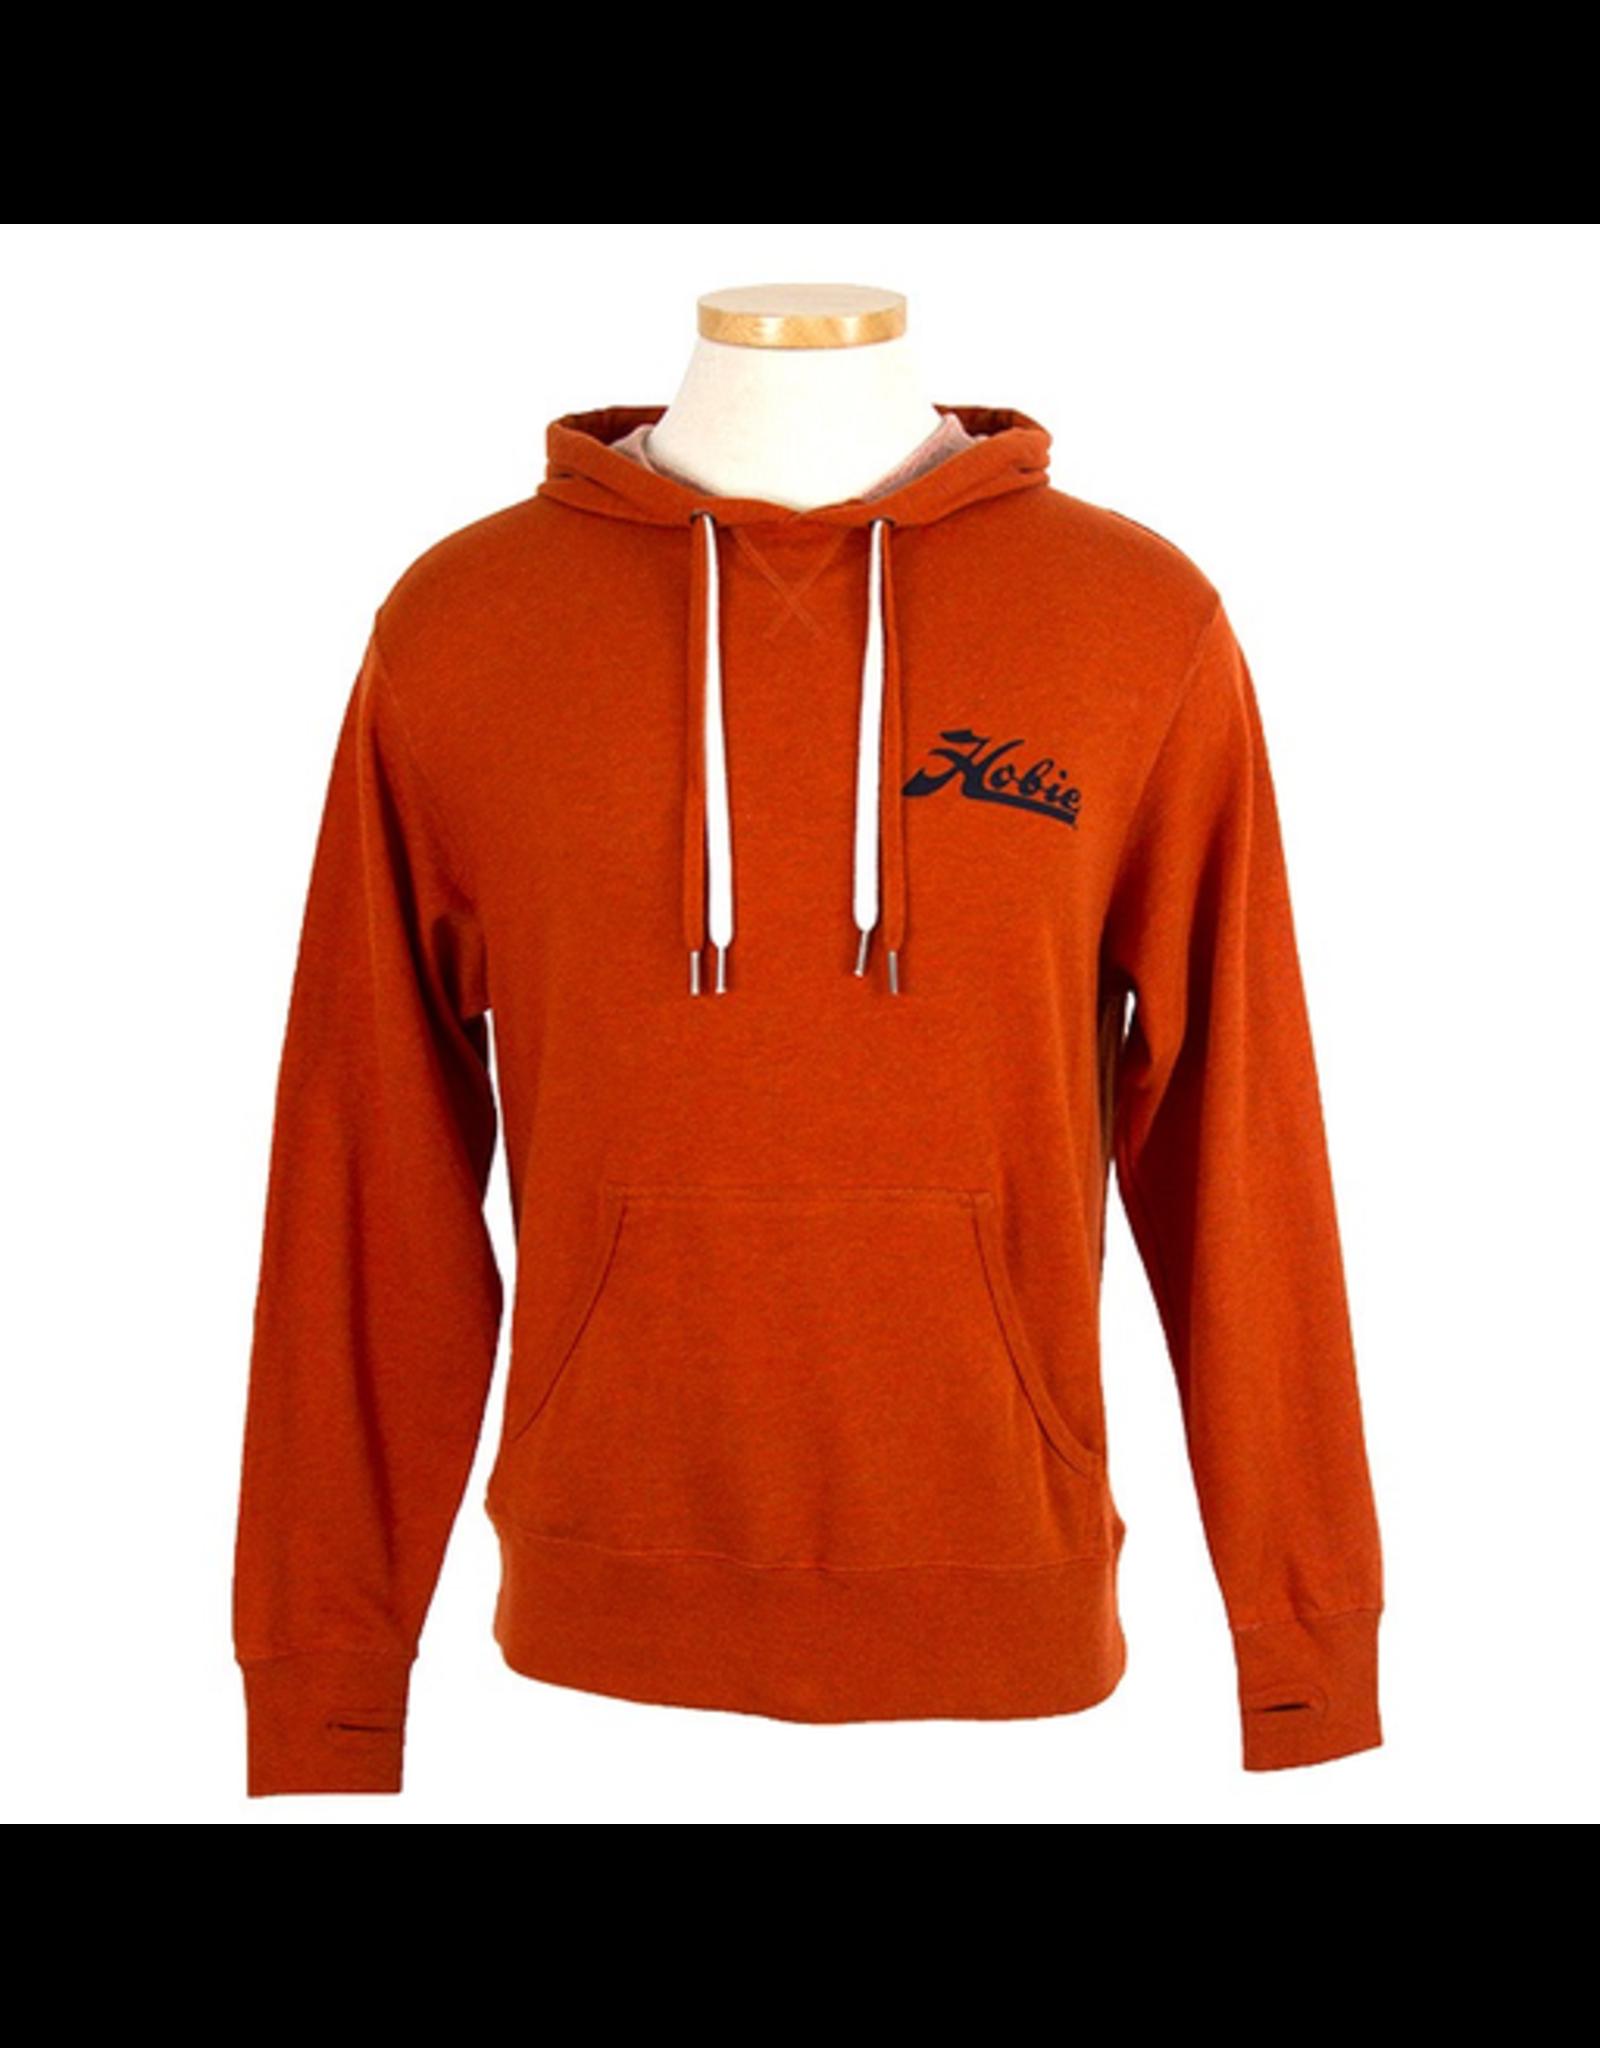 Hobie Hobie Burnt Orange Pull-over Hoodie, Unisex, Hobie Script Logo,